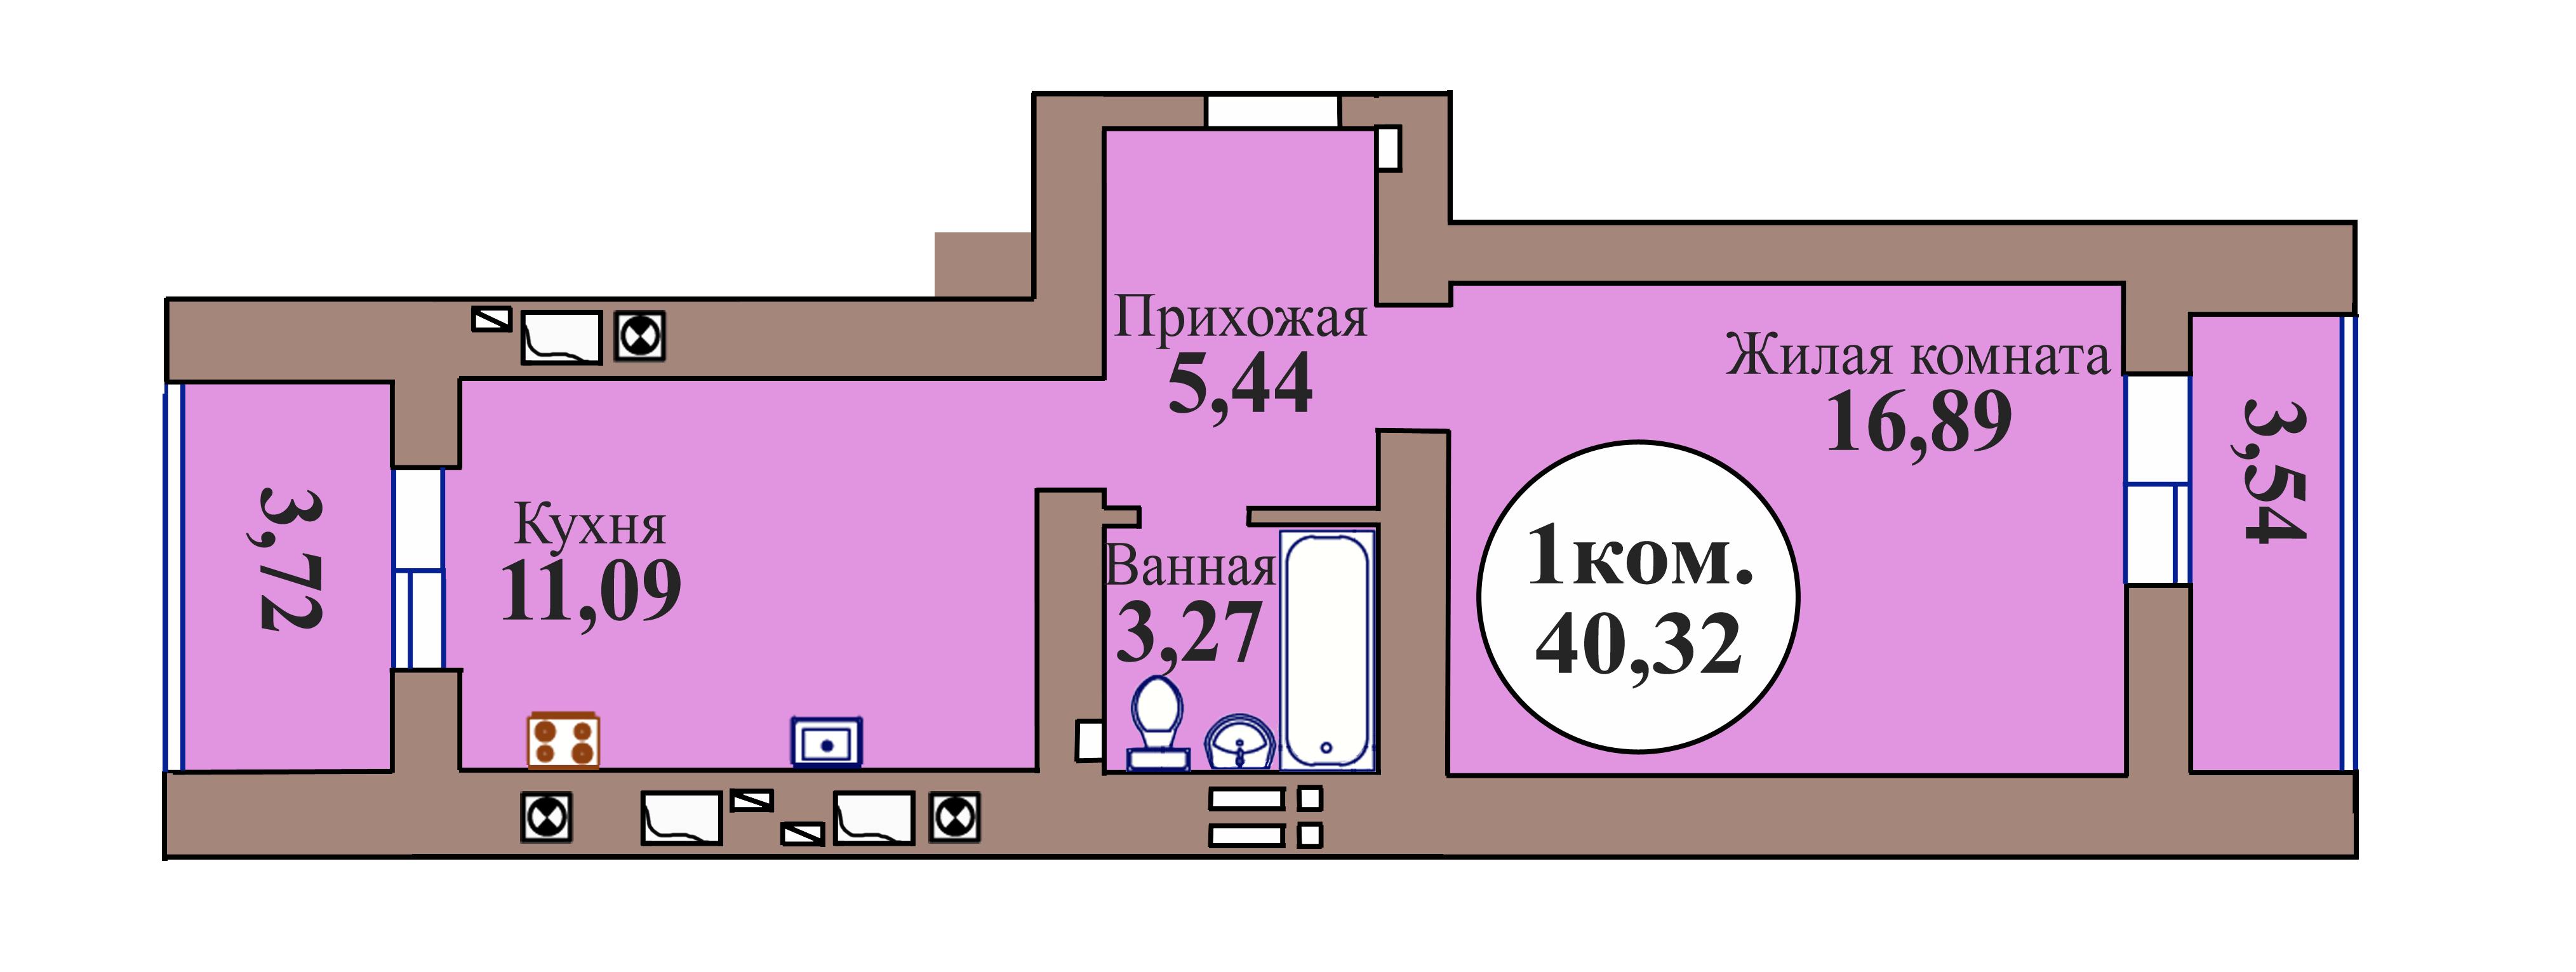 1-комн. кв. по пер. Калининградский, 5 кв. 18 в Калининграде